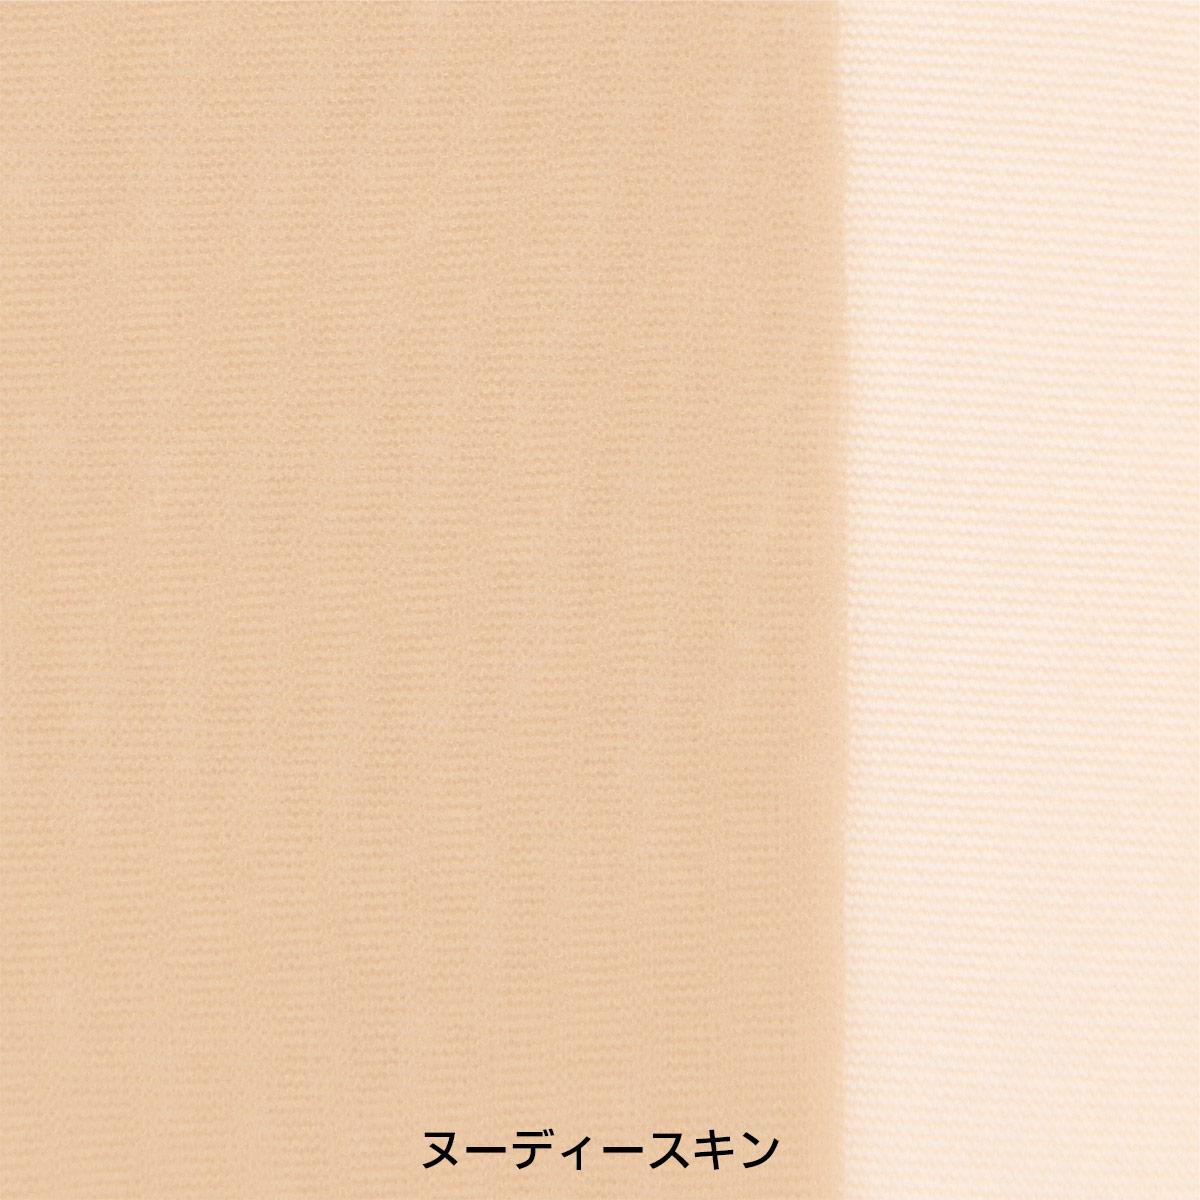 NAIGAI COMFORT ナイガイ コンフォート レディース ストッキング つま先スルー 交編 素肌的クリア肌 1003011【ゆうパケット・4点まで】